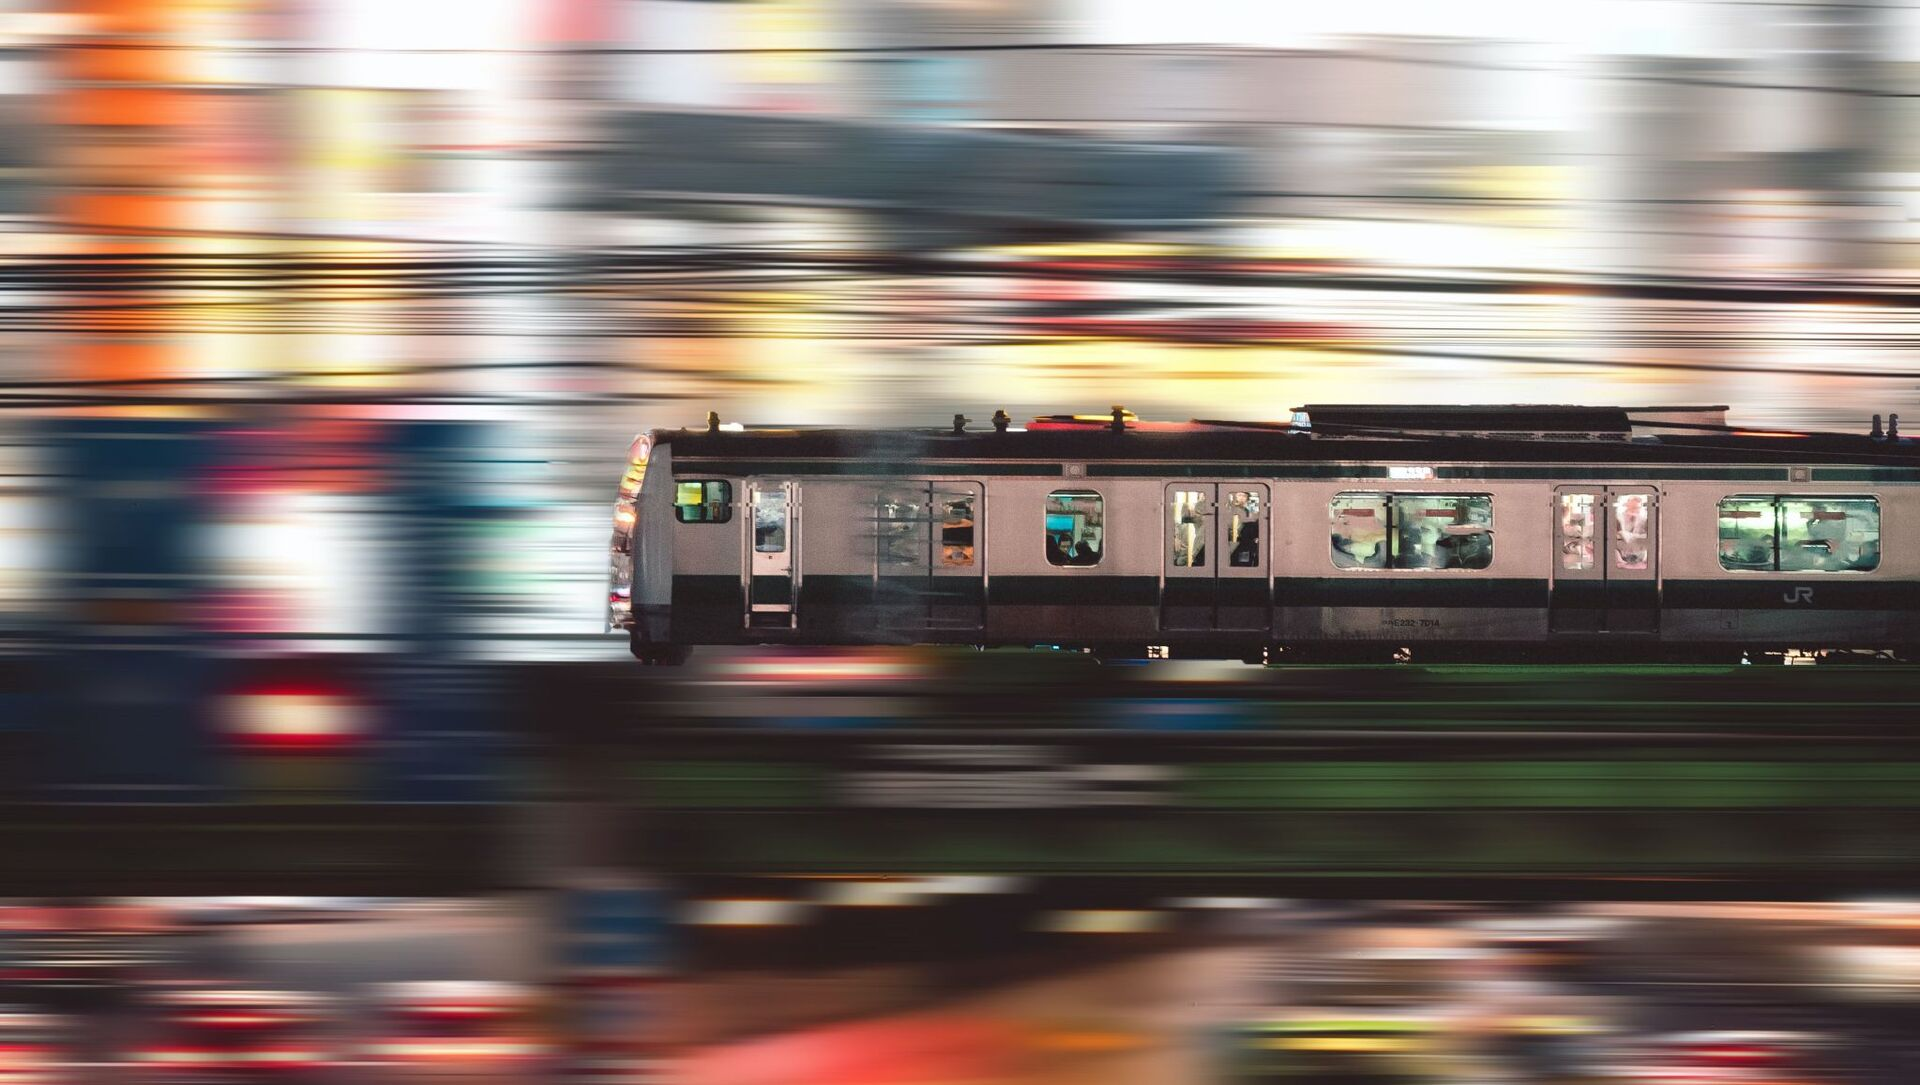 Un train (image d'illustration) - Sputnik France, 1920, 11.08.2021